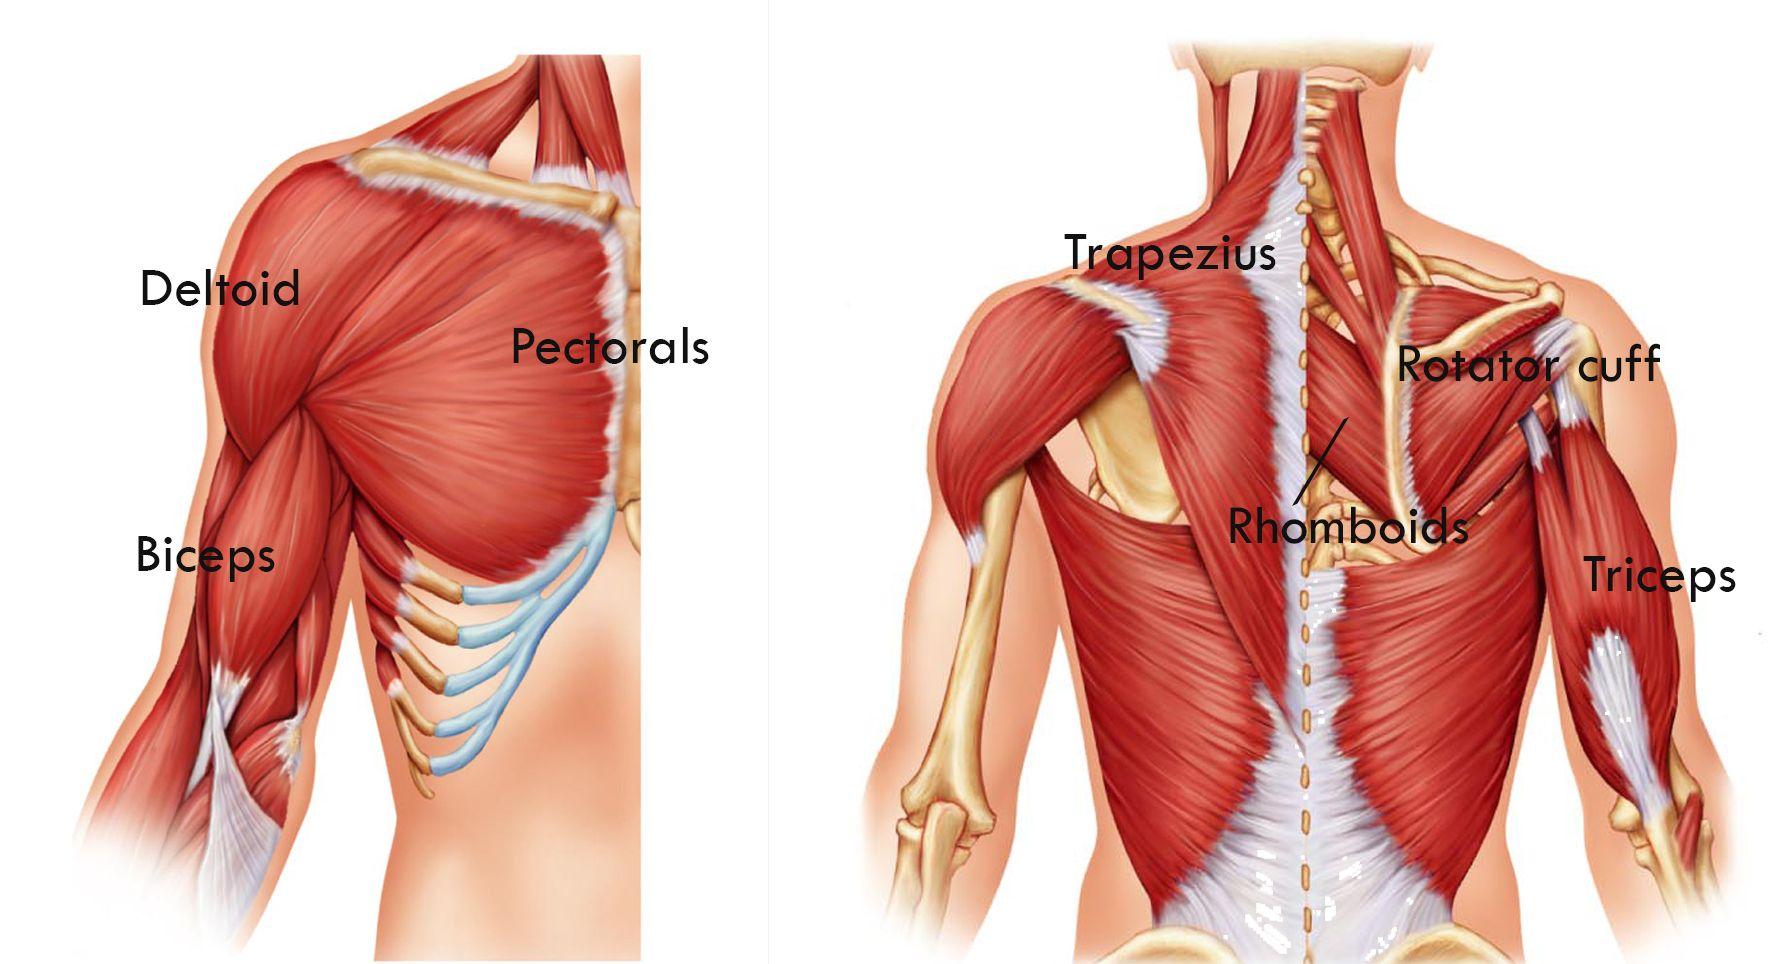 Exercises For The Upper Body Muscles Ot Study Material Pinterest